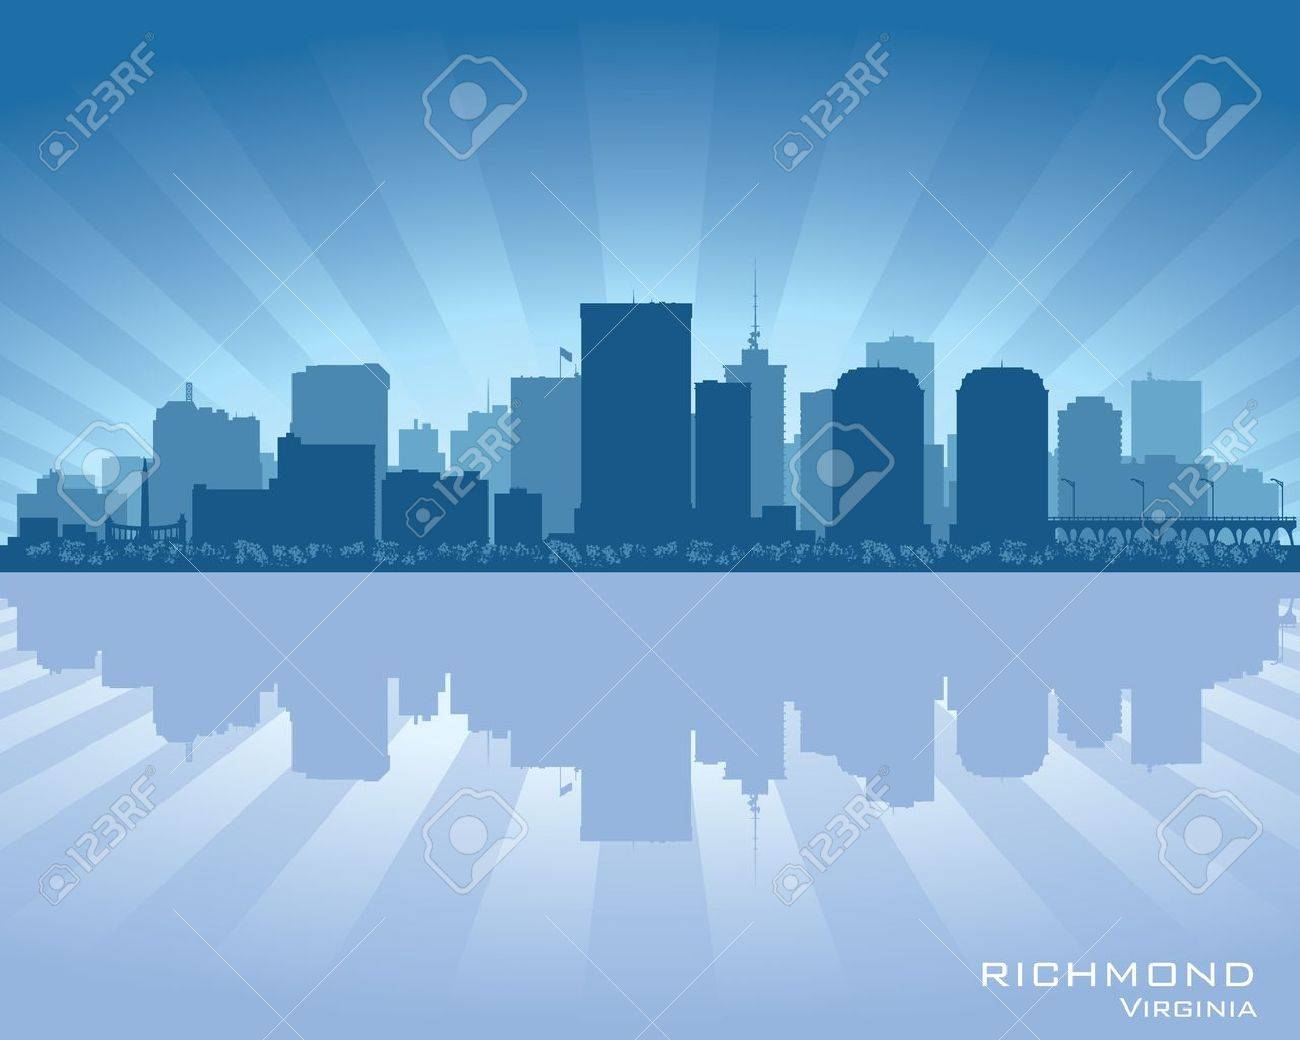 Richmond, Virginia skyline city silhouette Stock Vector - 17598672